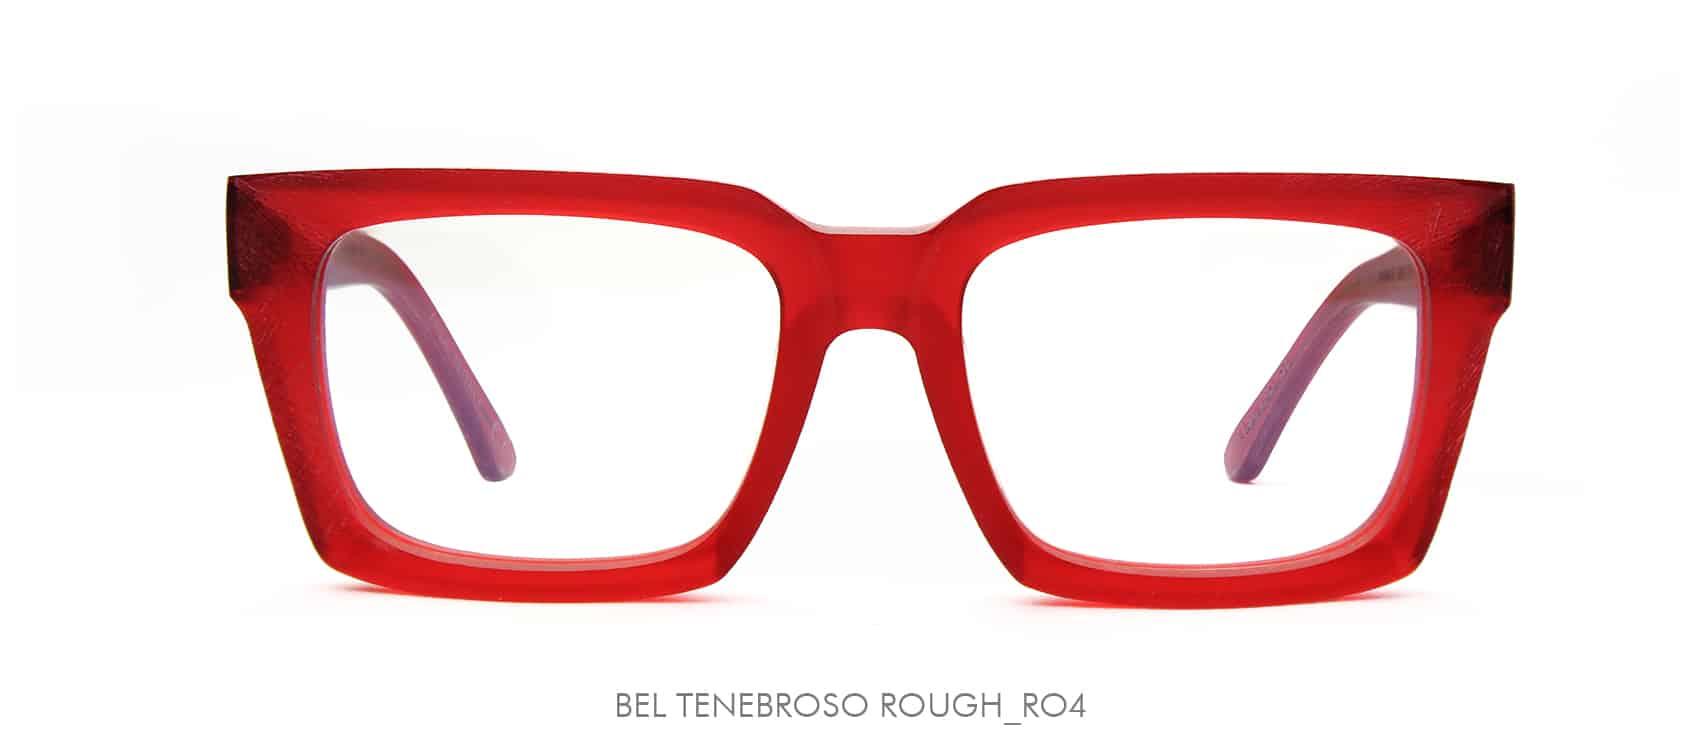 Dandy's eyewear Bel Tenebroso, Rough version